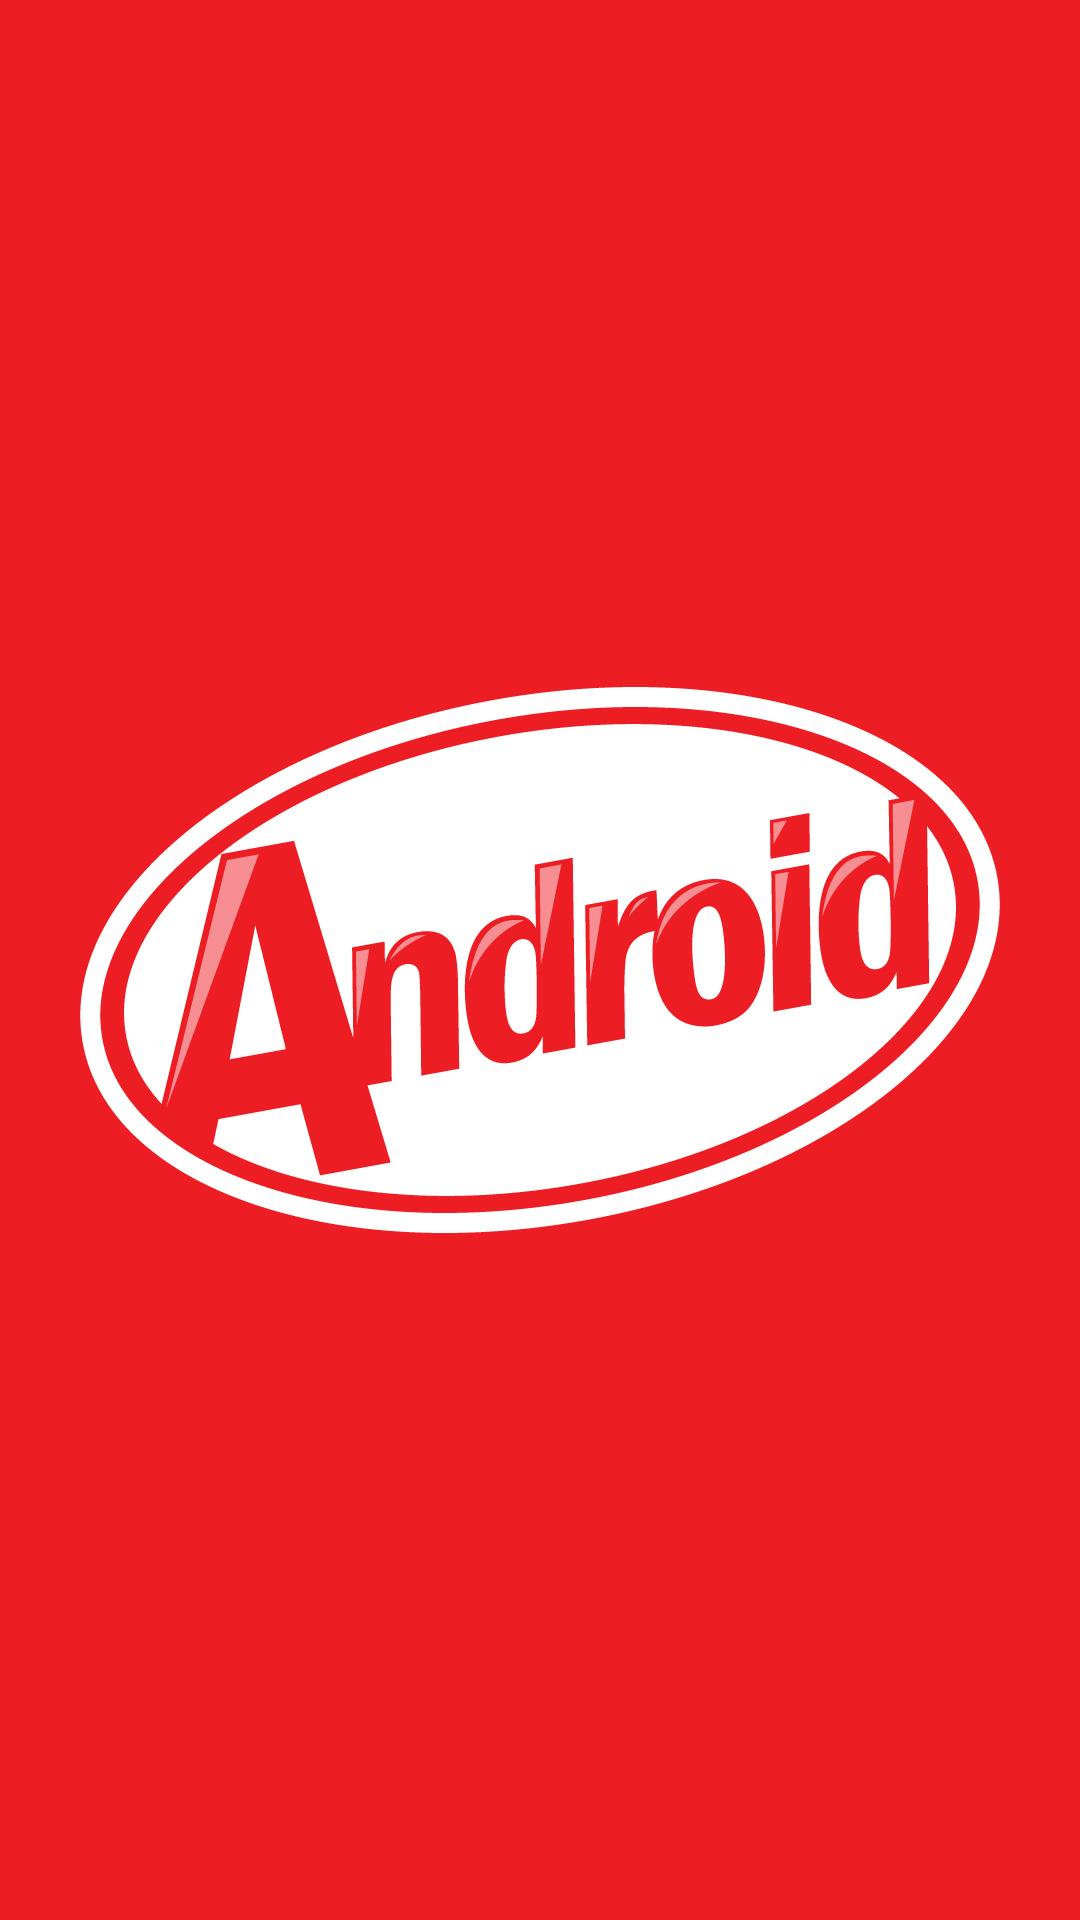 Android-KitKat-Logo-wallpaper-wp5403245